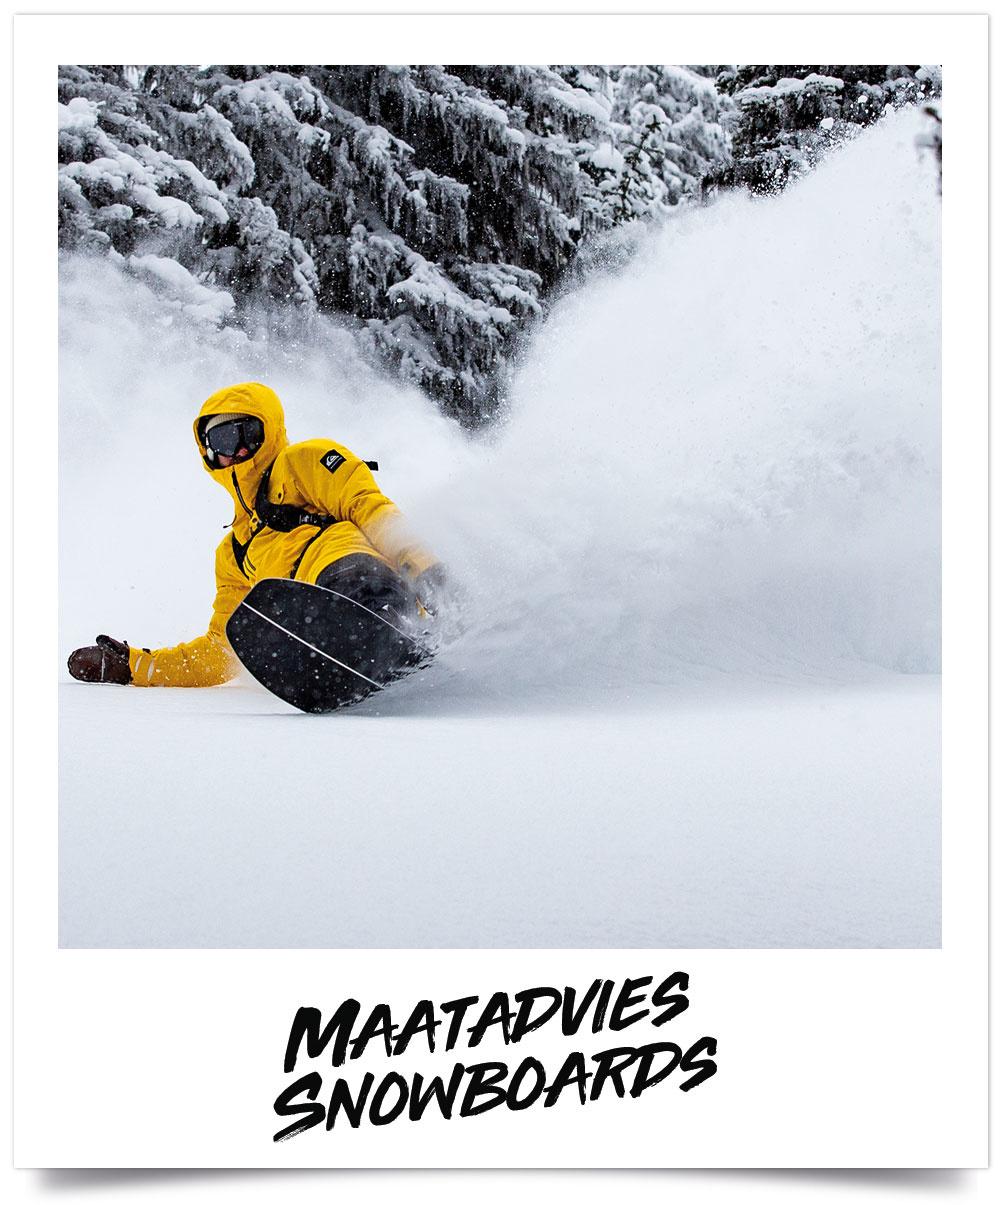 Maattabel Snowboards